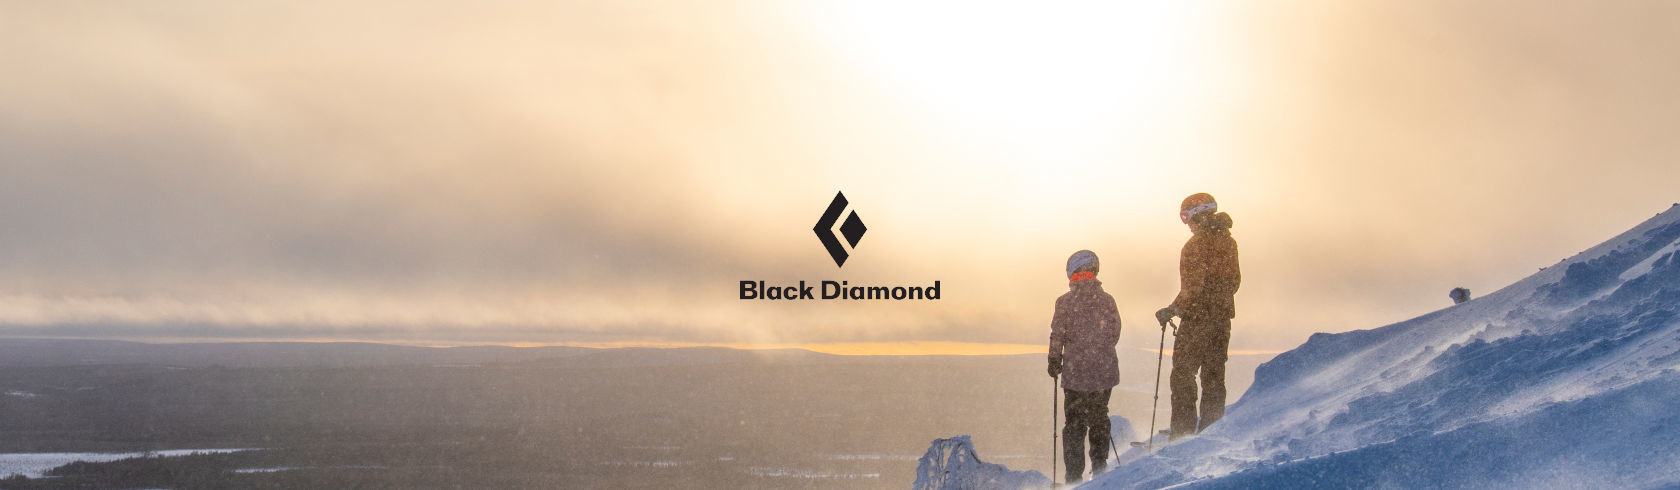 Black Diamond brand logo